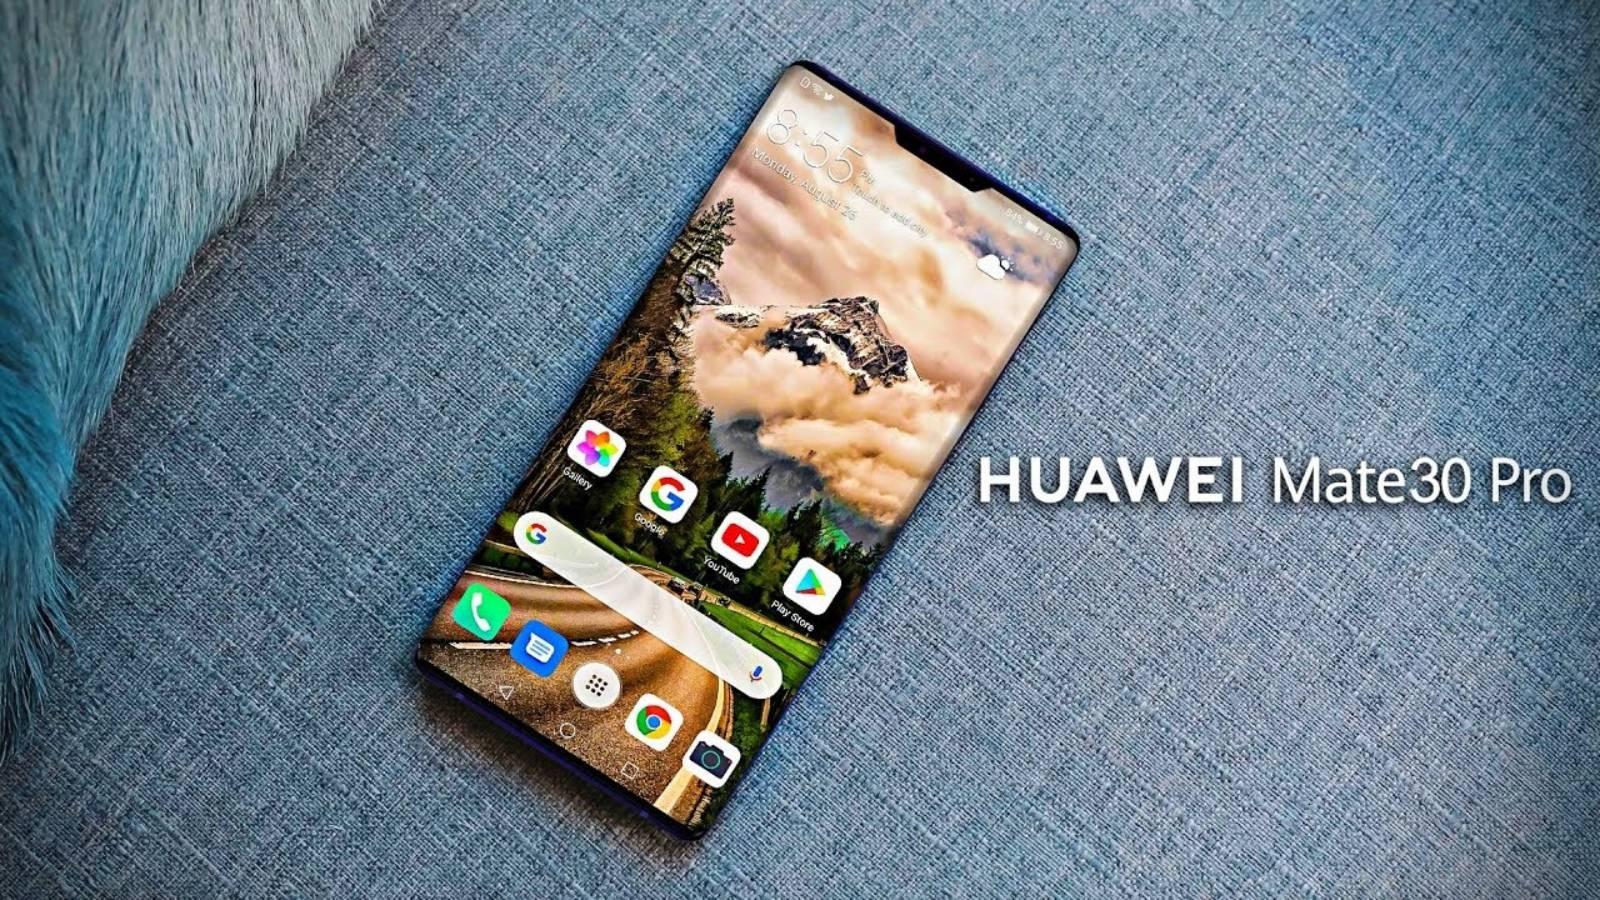 Huawei MATE 30 PRO. Uimitoare IMAGINE Noua cu o UNITATE REALA